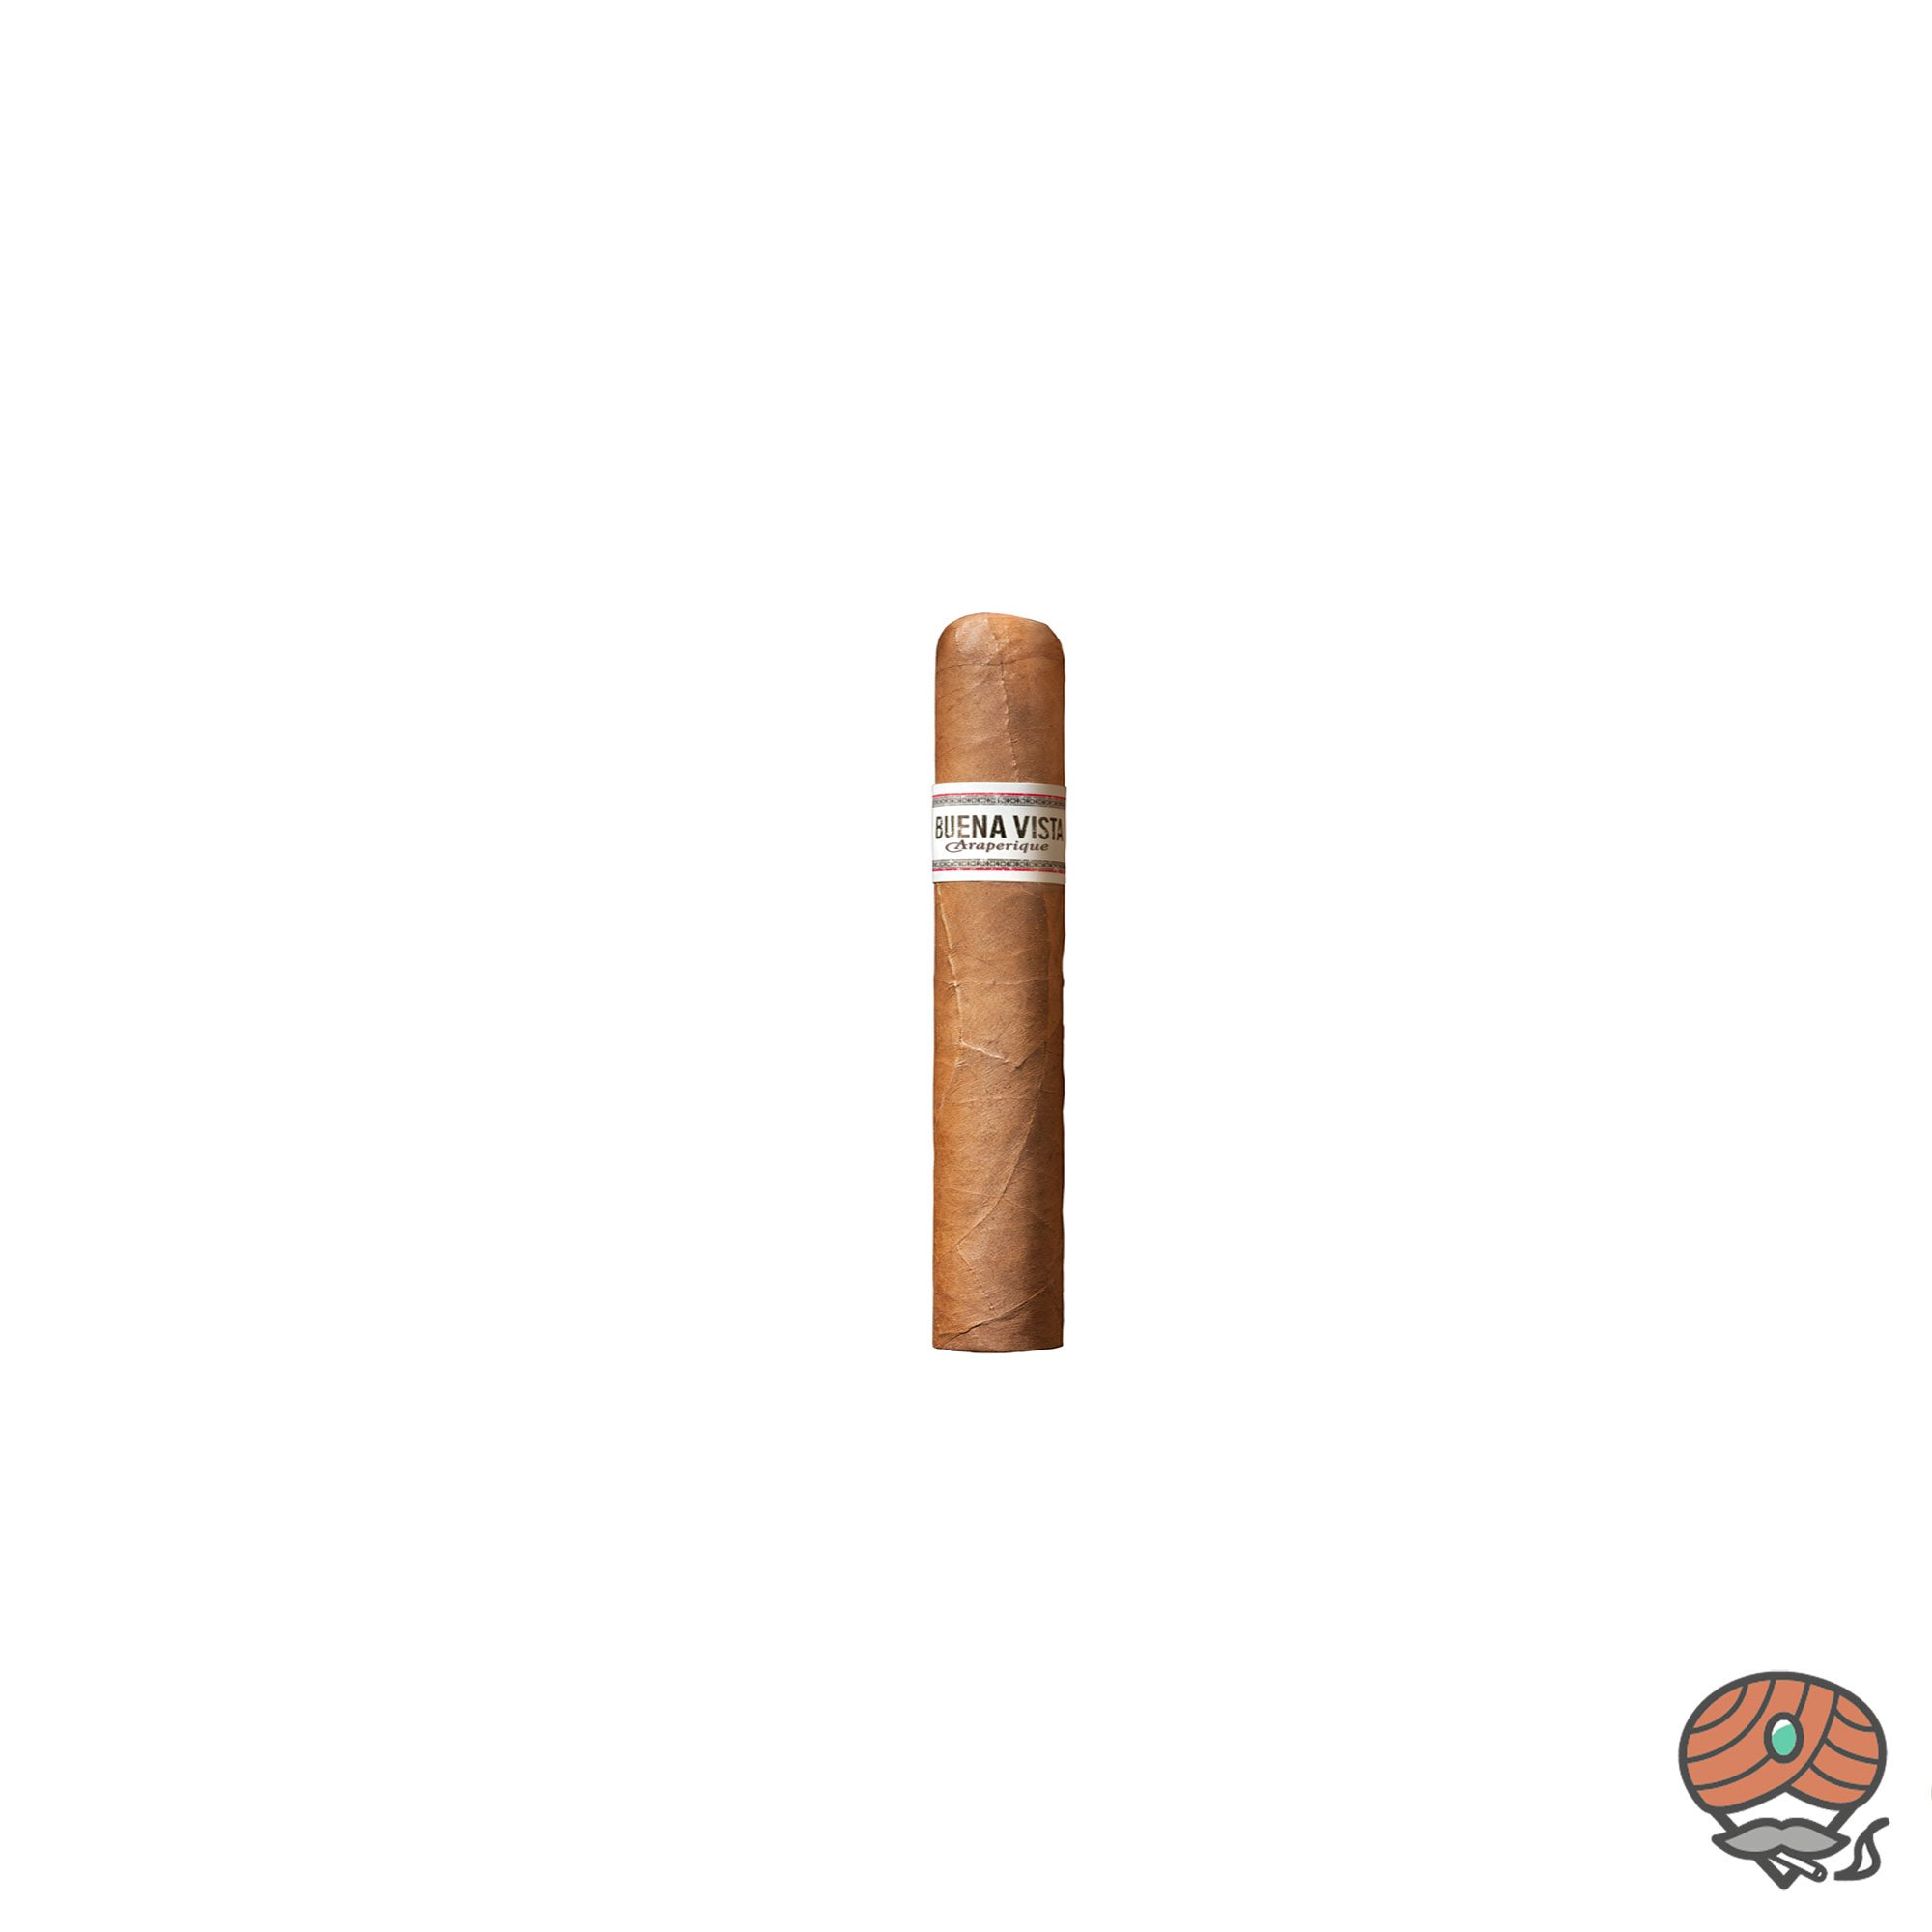 Buena Vista Araperique Short Robusto Zigarre Dominikanische Republik